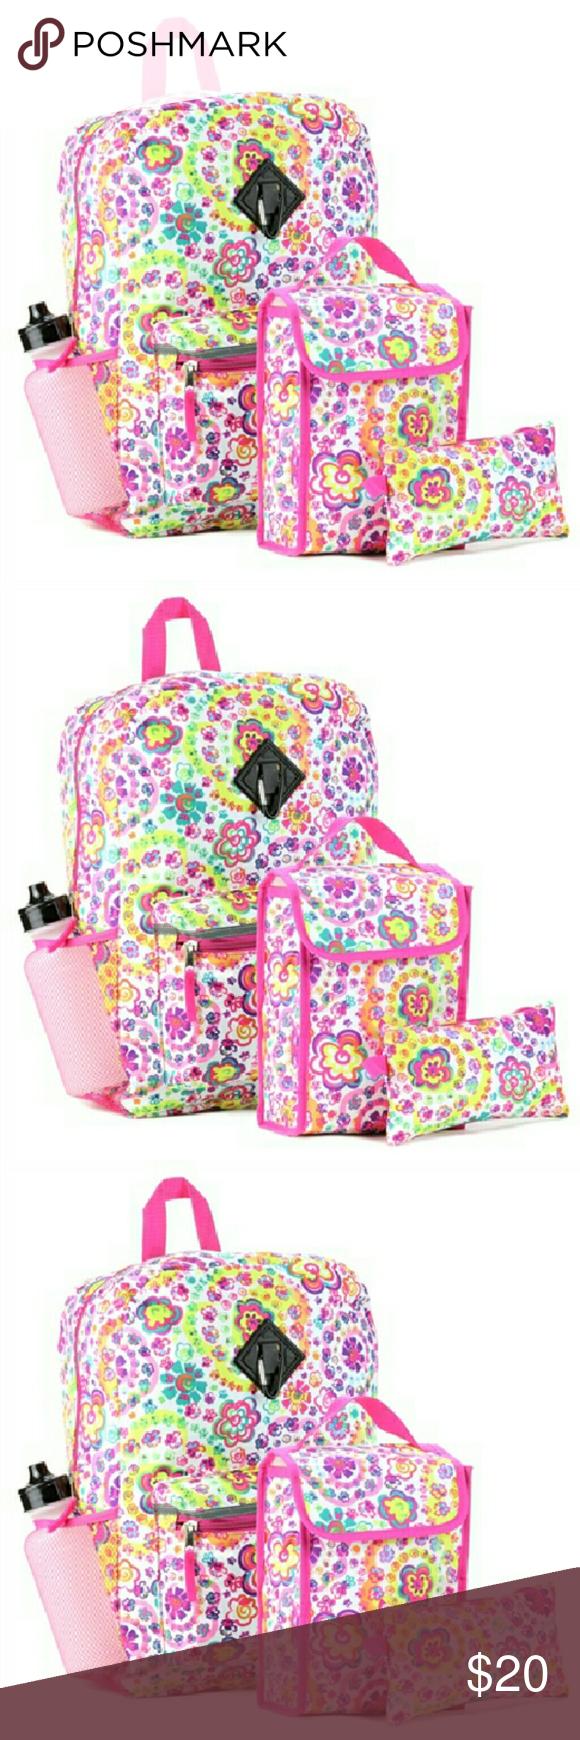 d588e18aae Confetti Girl 5 Piece Backpack 16